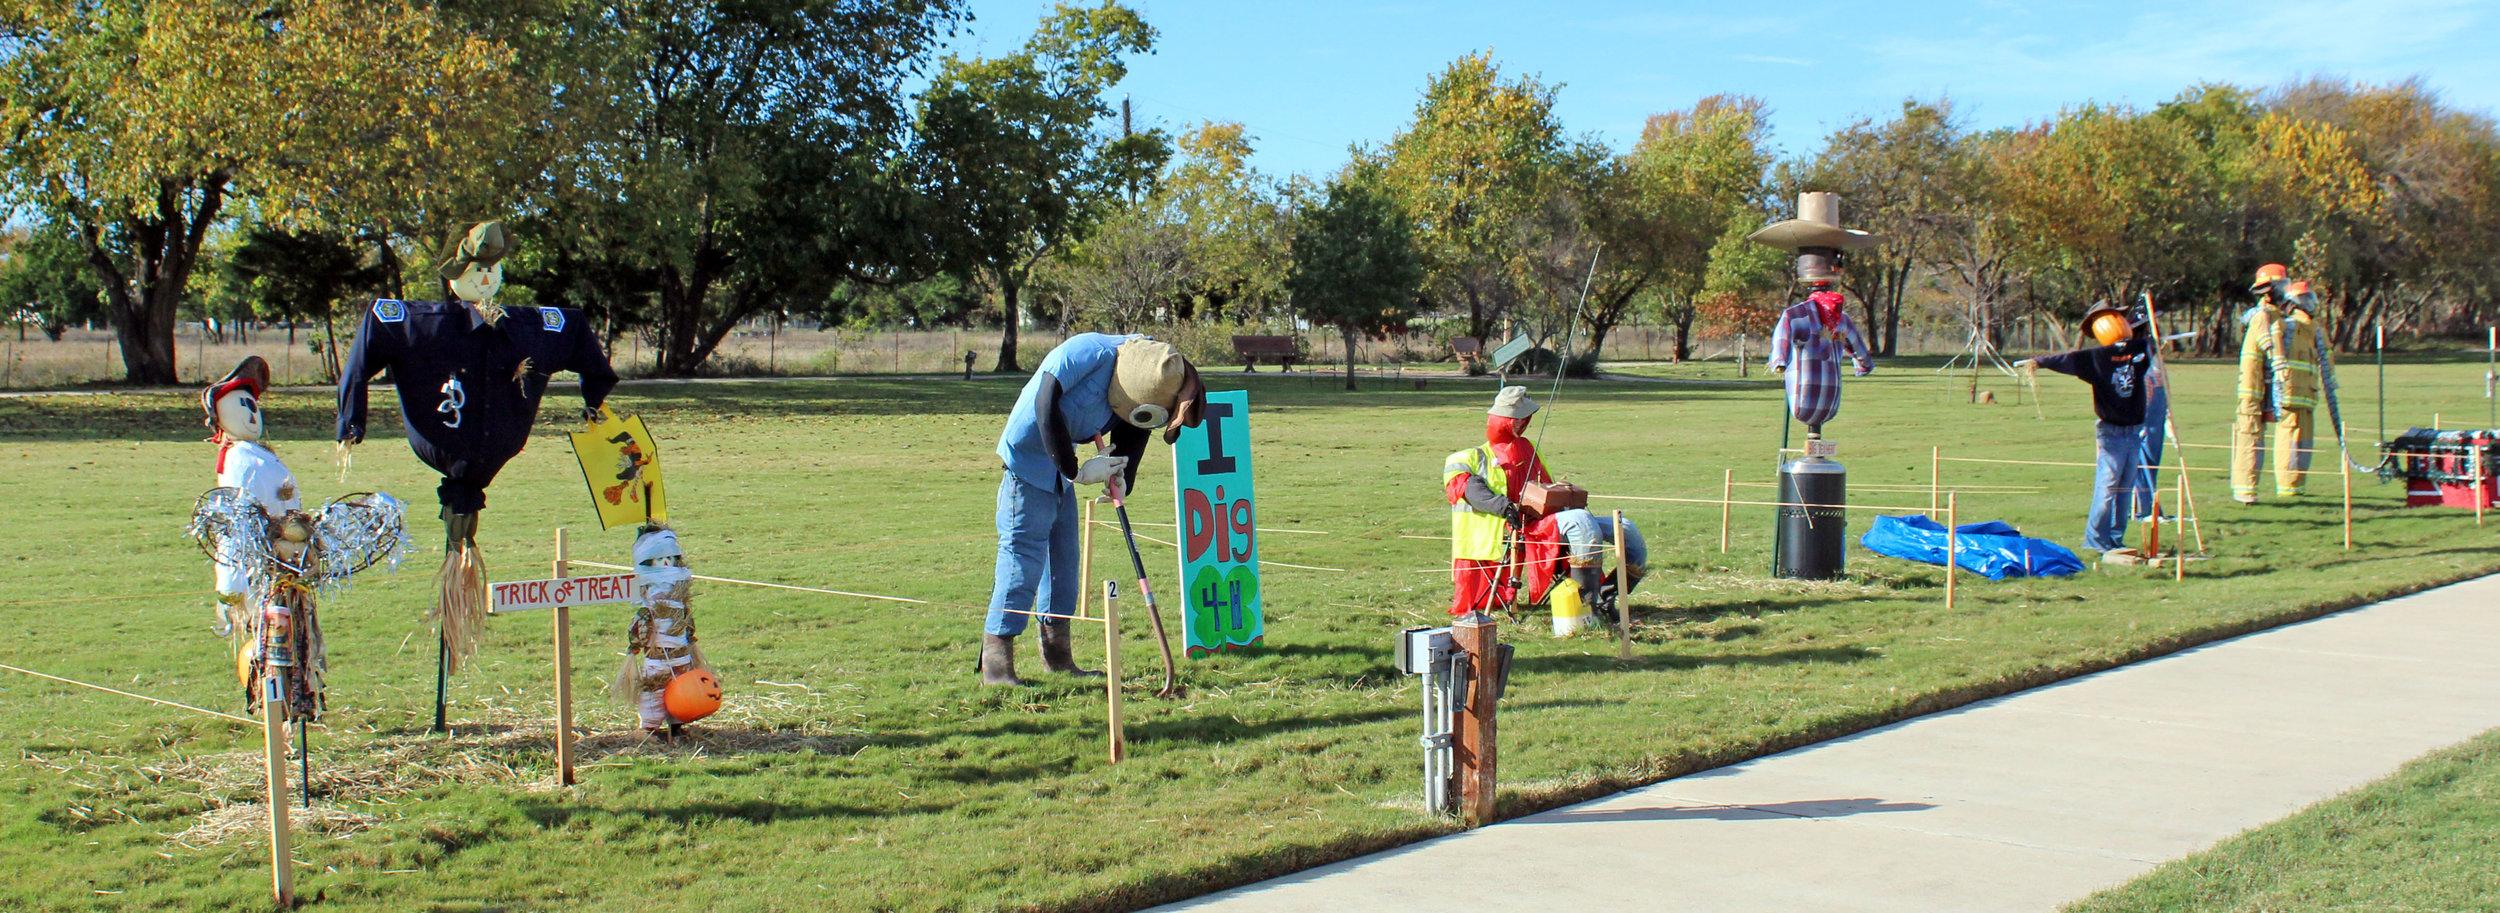 Lucas Arbor scarecrow.jpg